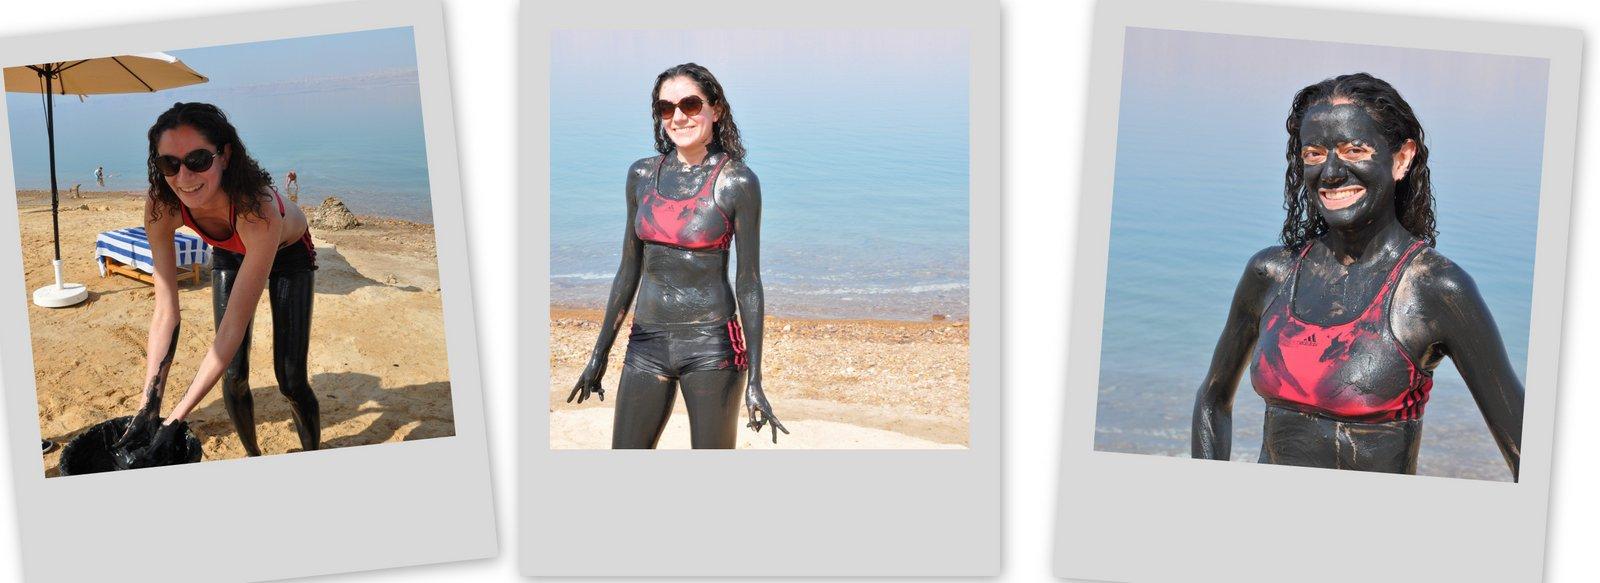 mar muerto barro jordania